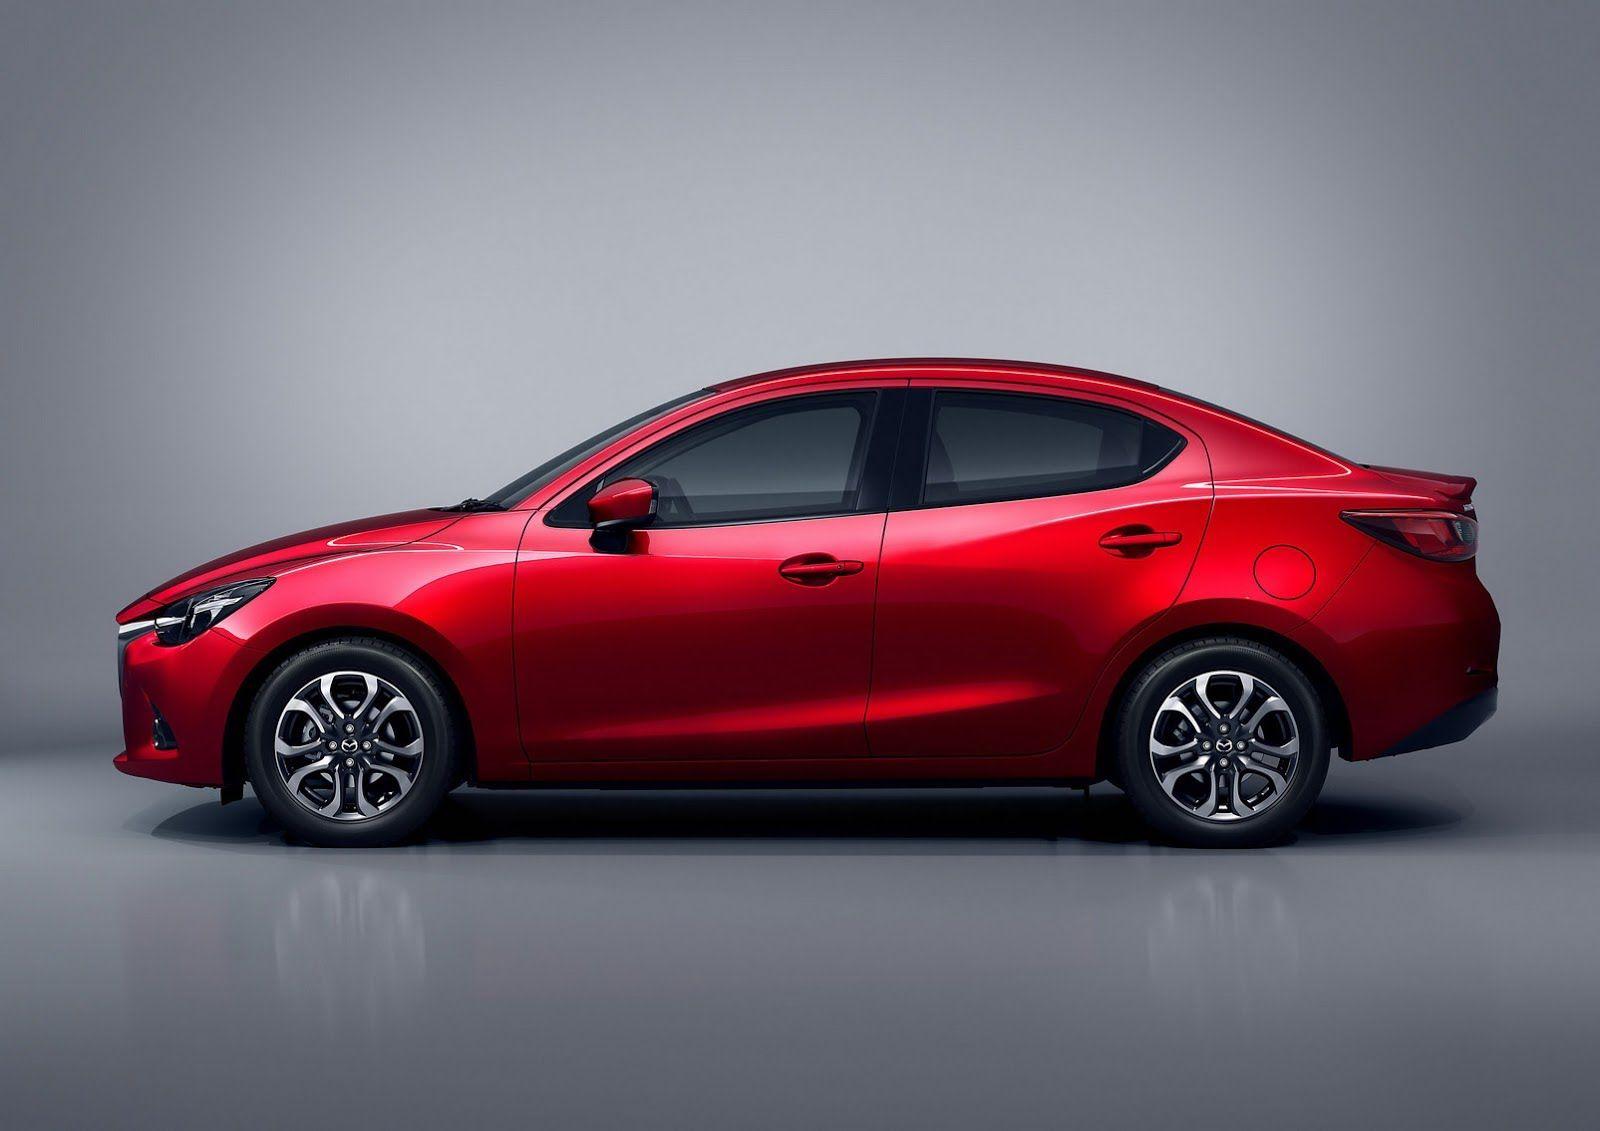 2016 Mazda2 Sedan Revealed Set To Debut At Thailand International Motor Expo 2014 On Nov 28th Engine Is A Skyactiv D 1 5 L Mazda Mazda 2 Mazda 3 Sedan